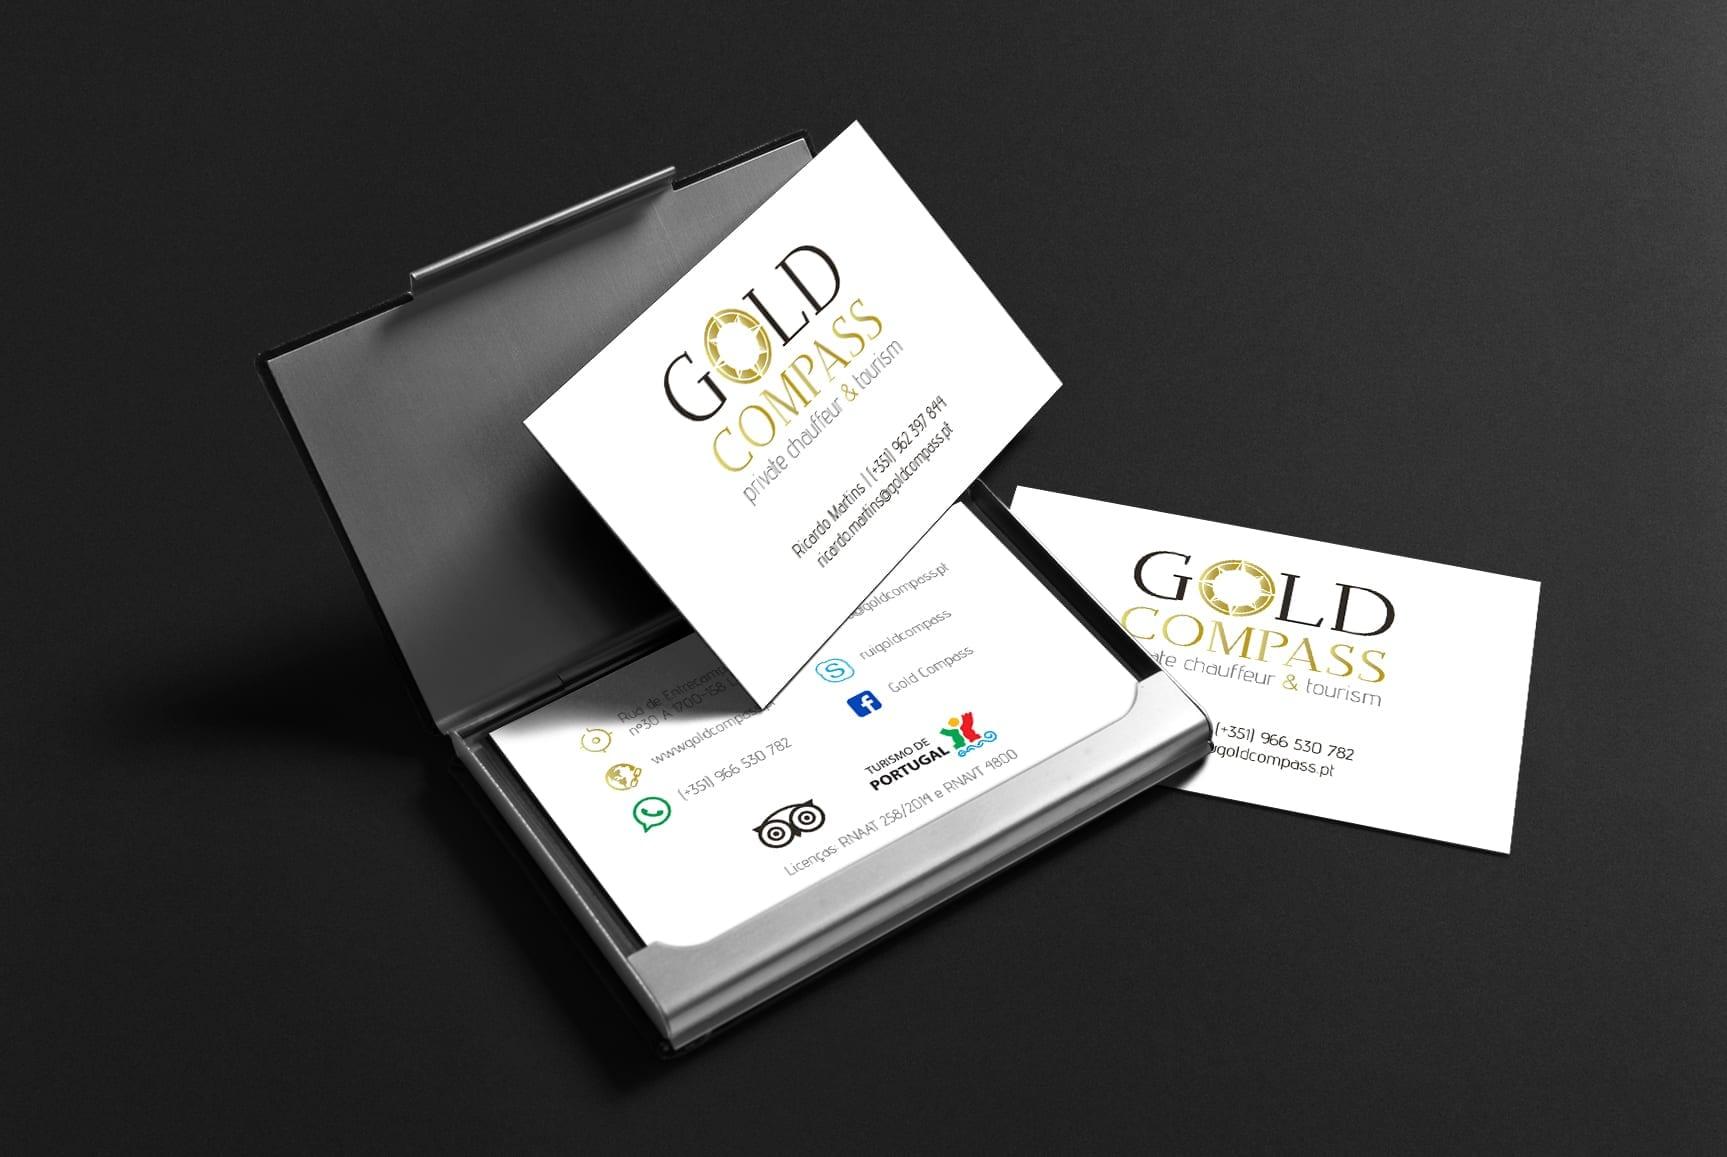 Mockup de cartões de visita para a Gold Compass